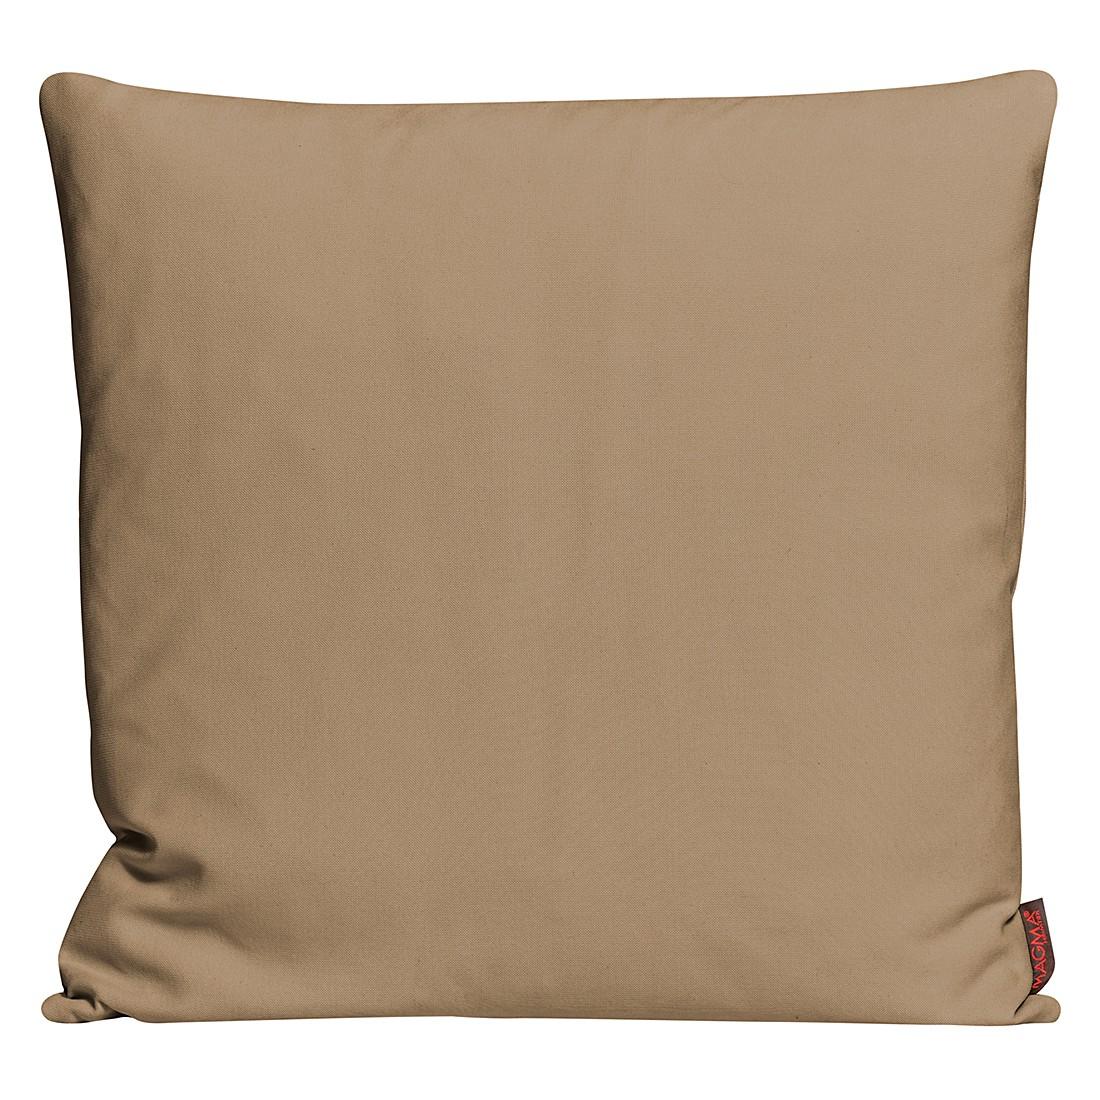 Kissenhülle Paso – Sand – Maße: 50 x 50 cm, Magma-Heimtex günstig